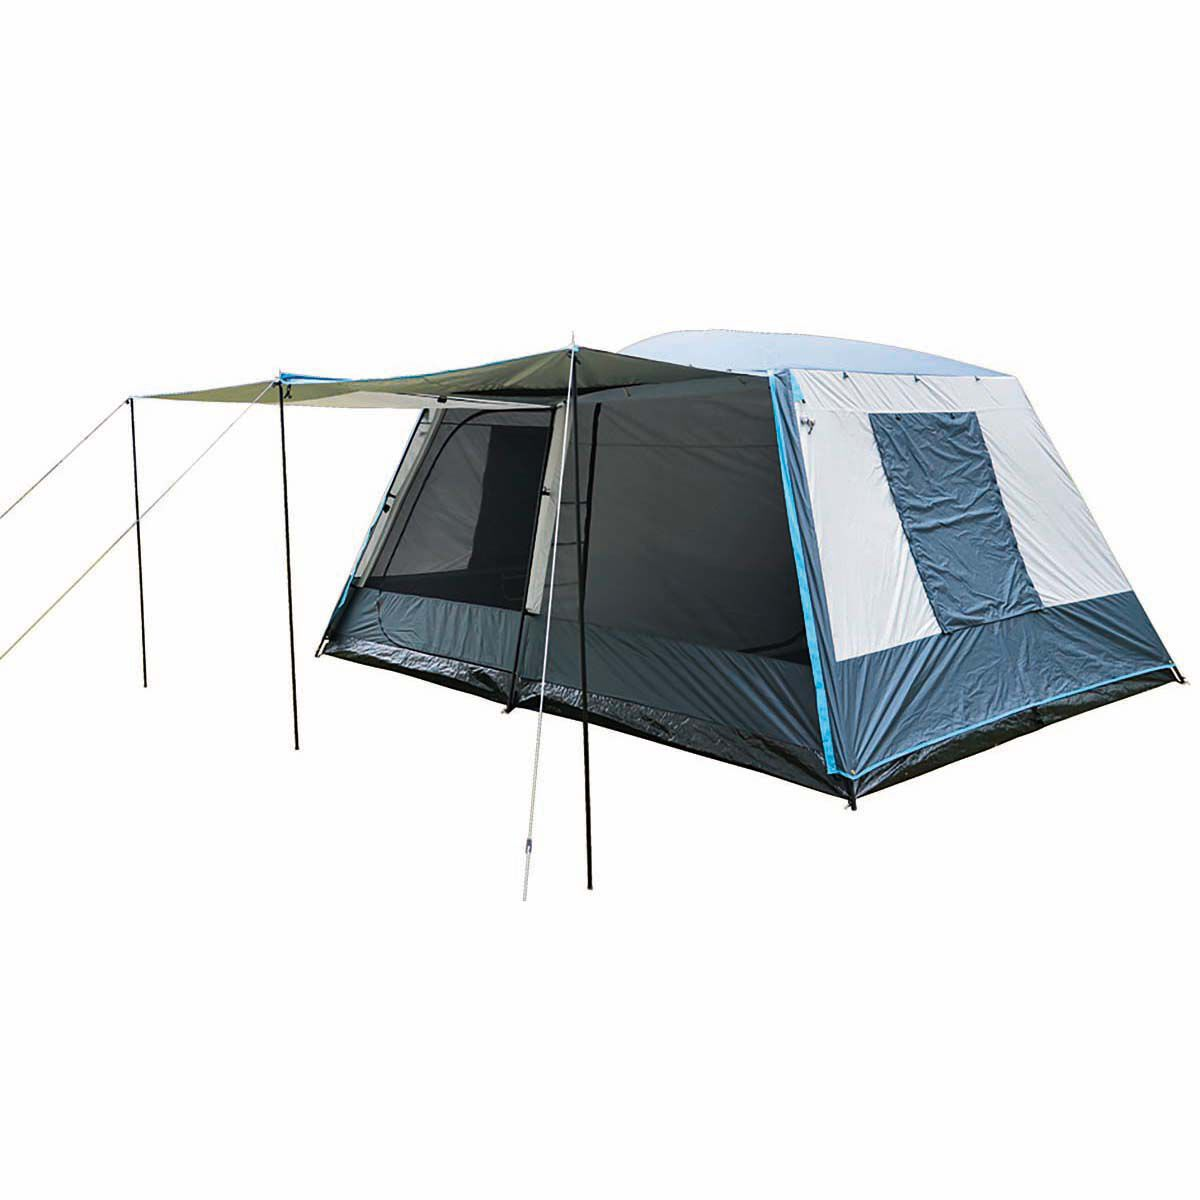 Wanderer Goliath II Dome Tent 10 Person  bcf_hi-res ...  sc 1 st  BCF Australia & Dome Tents - Buy Online - BCF Australia